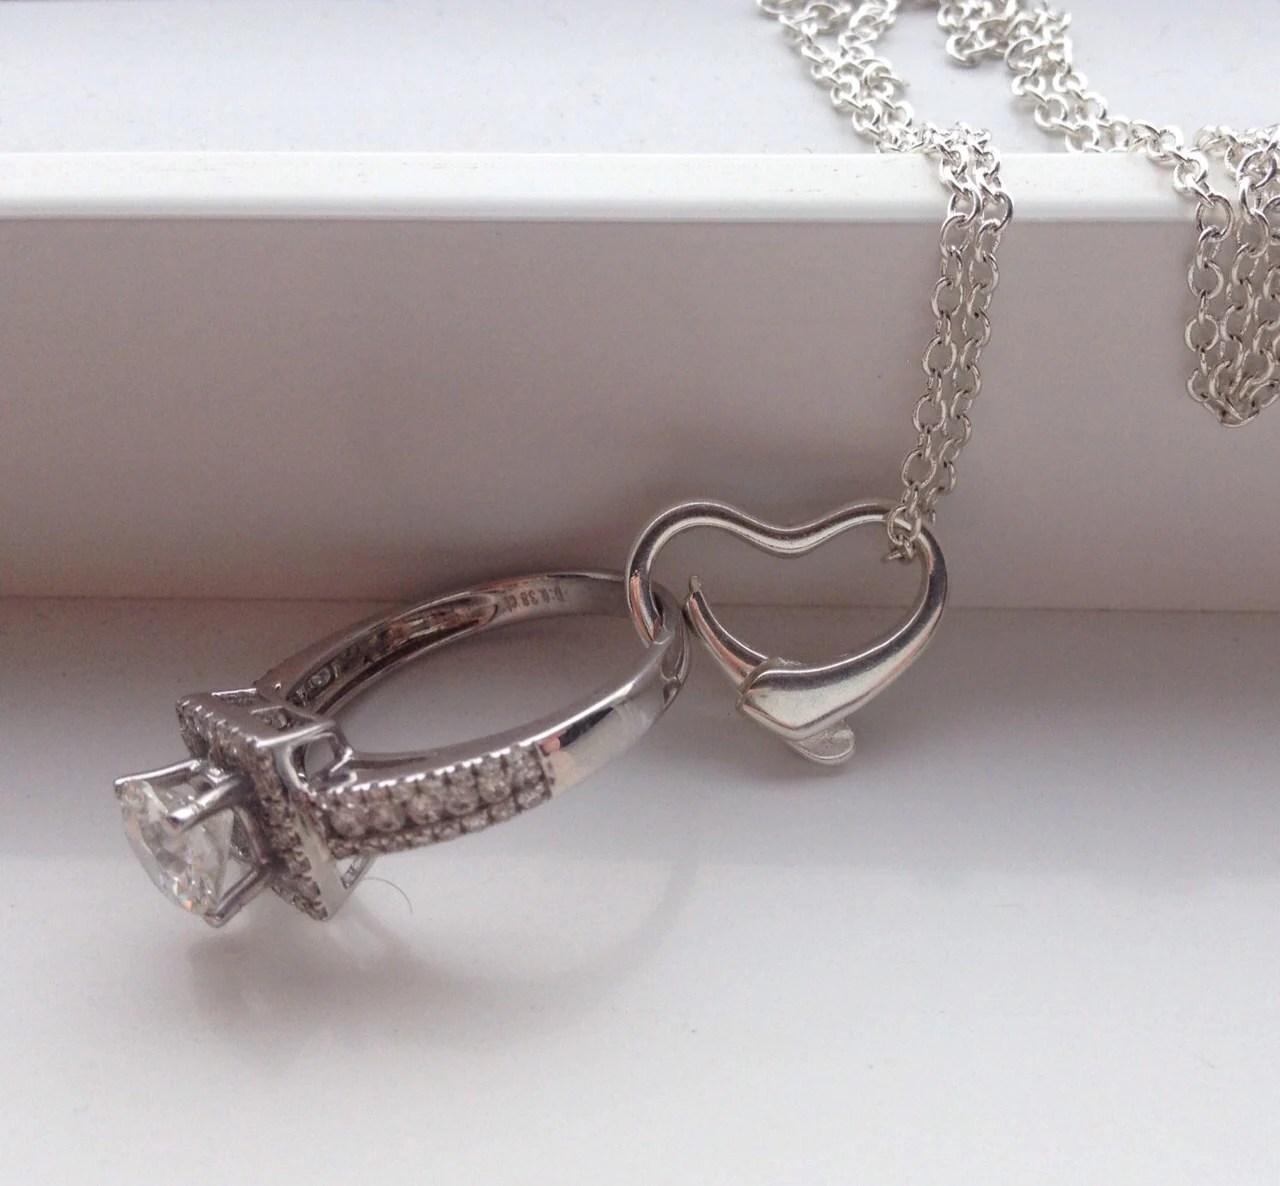 Ring Holder Necklace Wedding Engagementbridal By